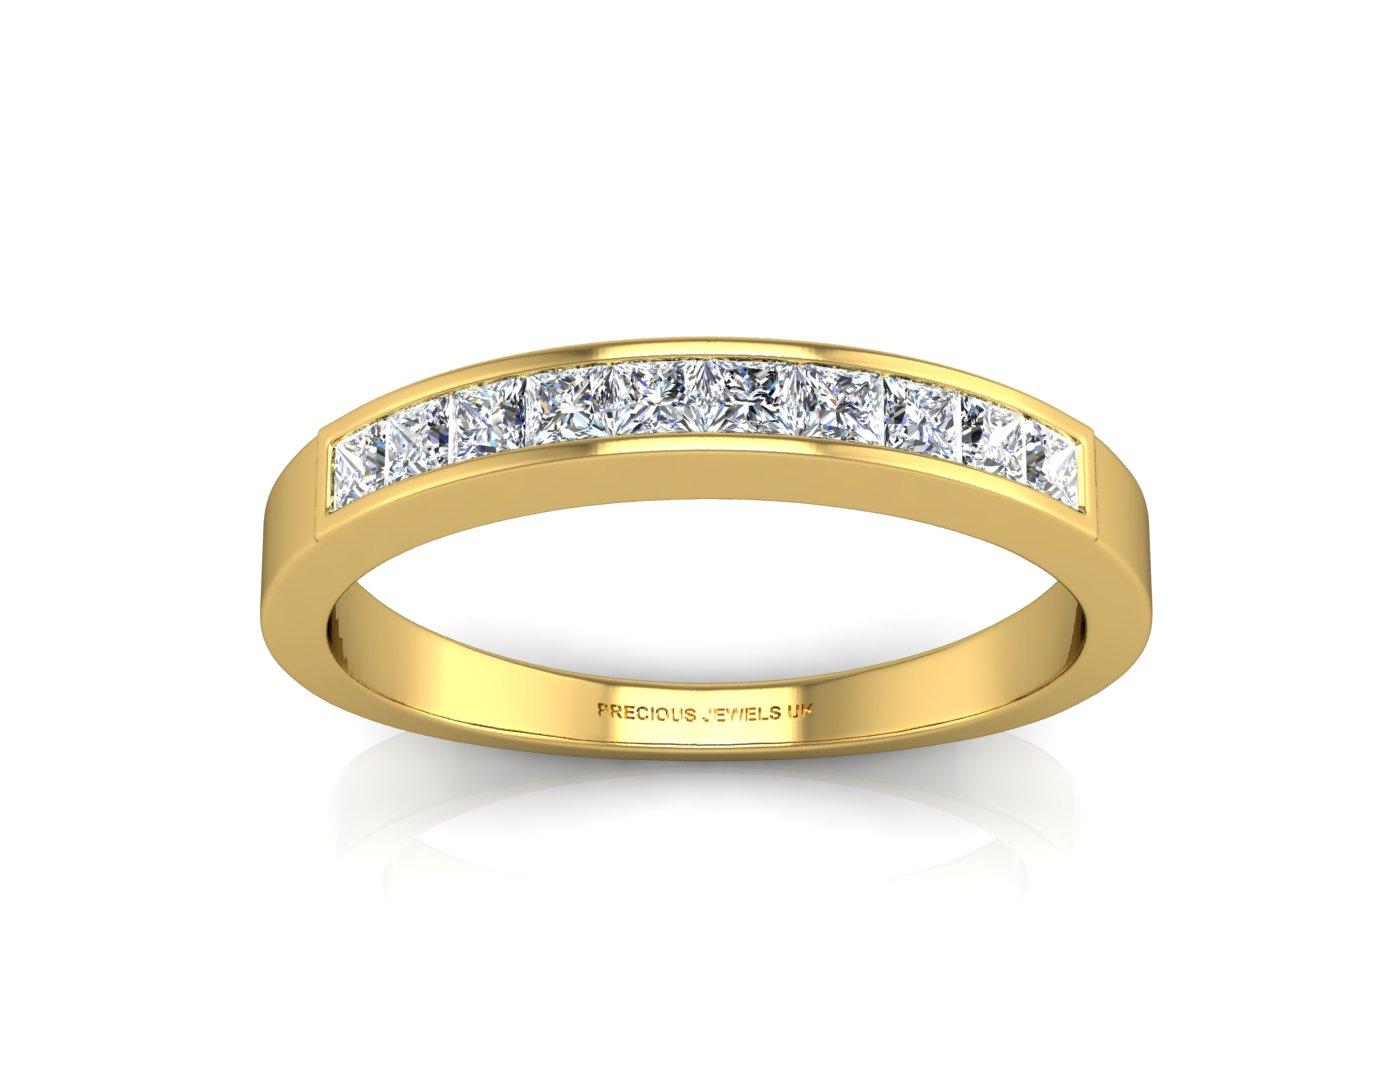 9ct Channel Set Semi Eternity Diamond Ring 0.50 Carats - Image 3 of 4